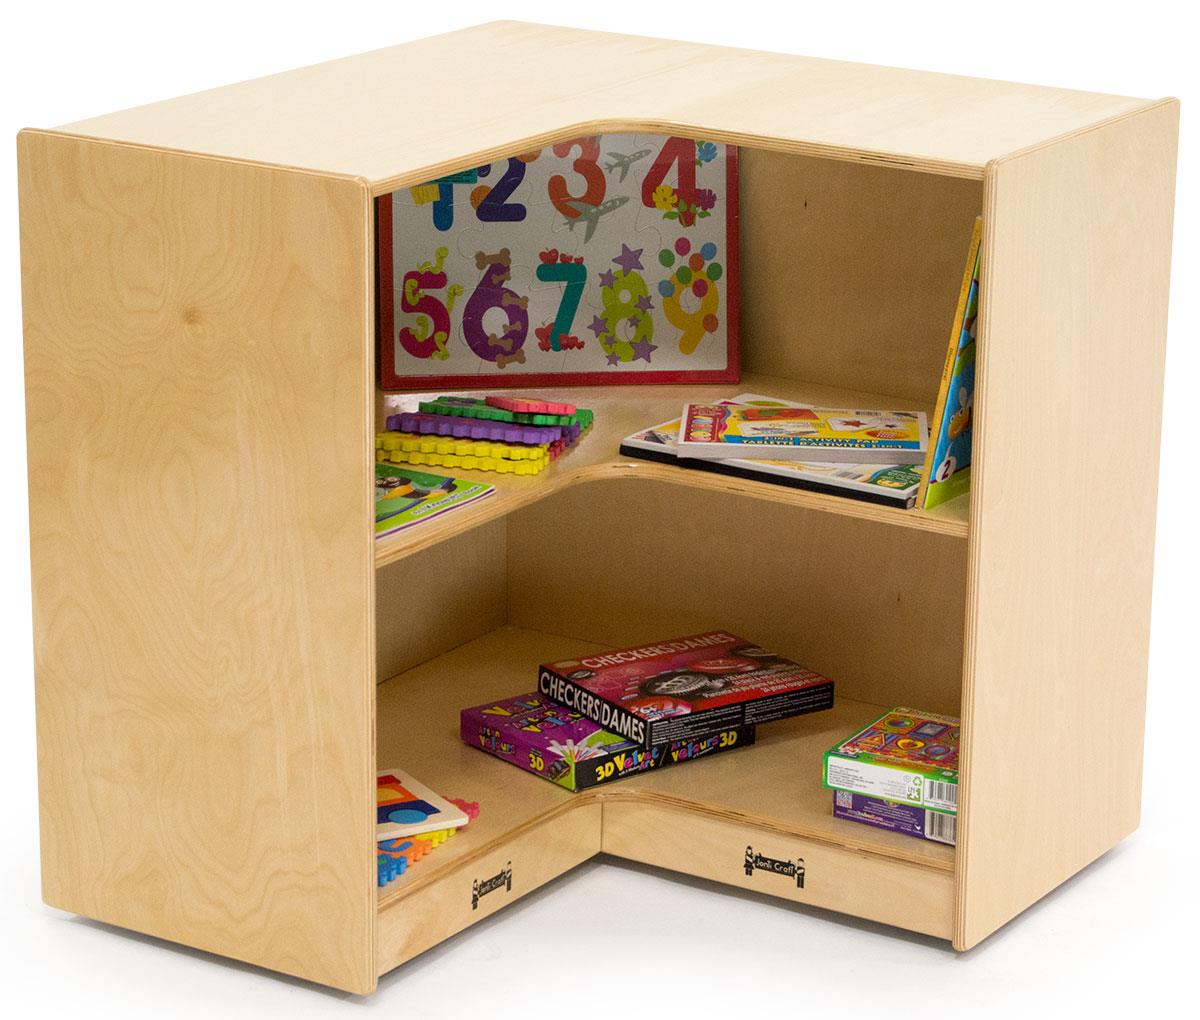 Childrens Corner Storage Case Deep Shelves